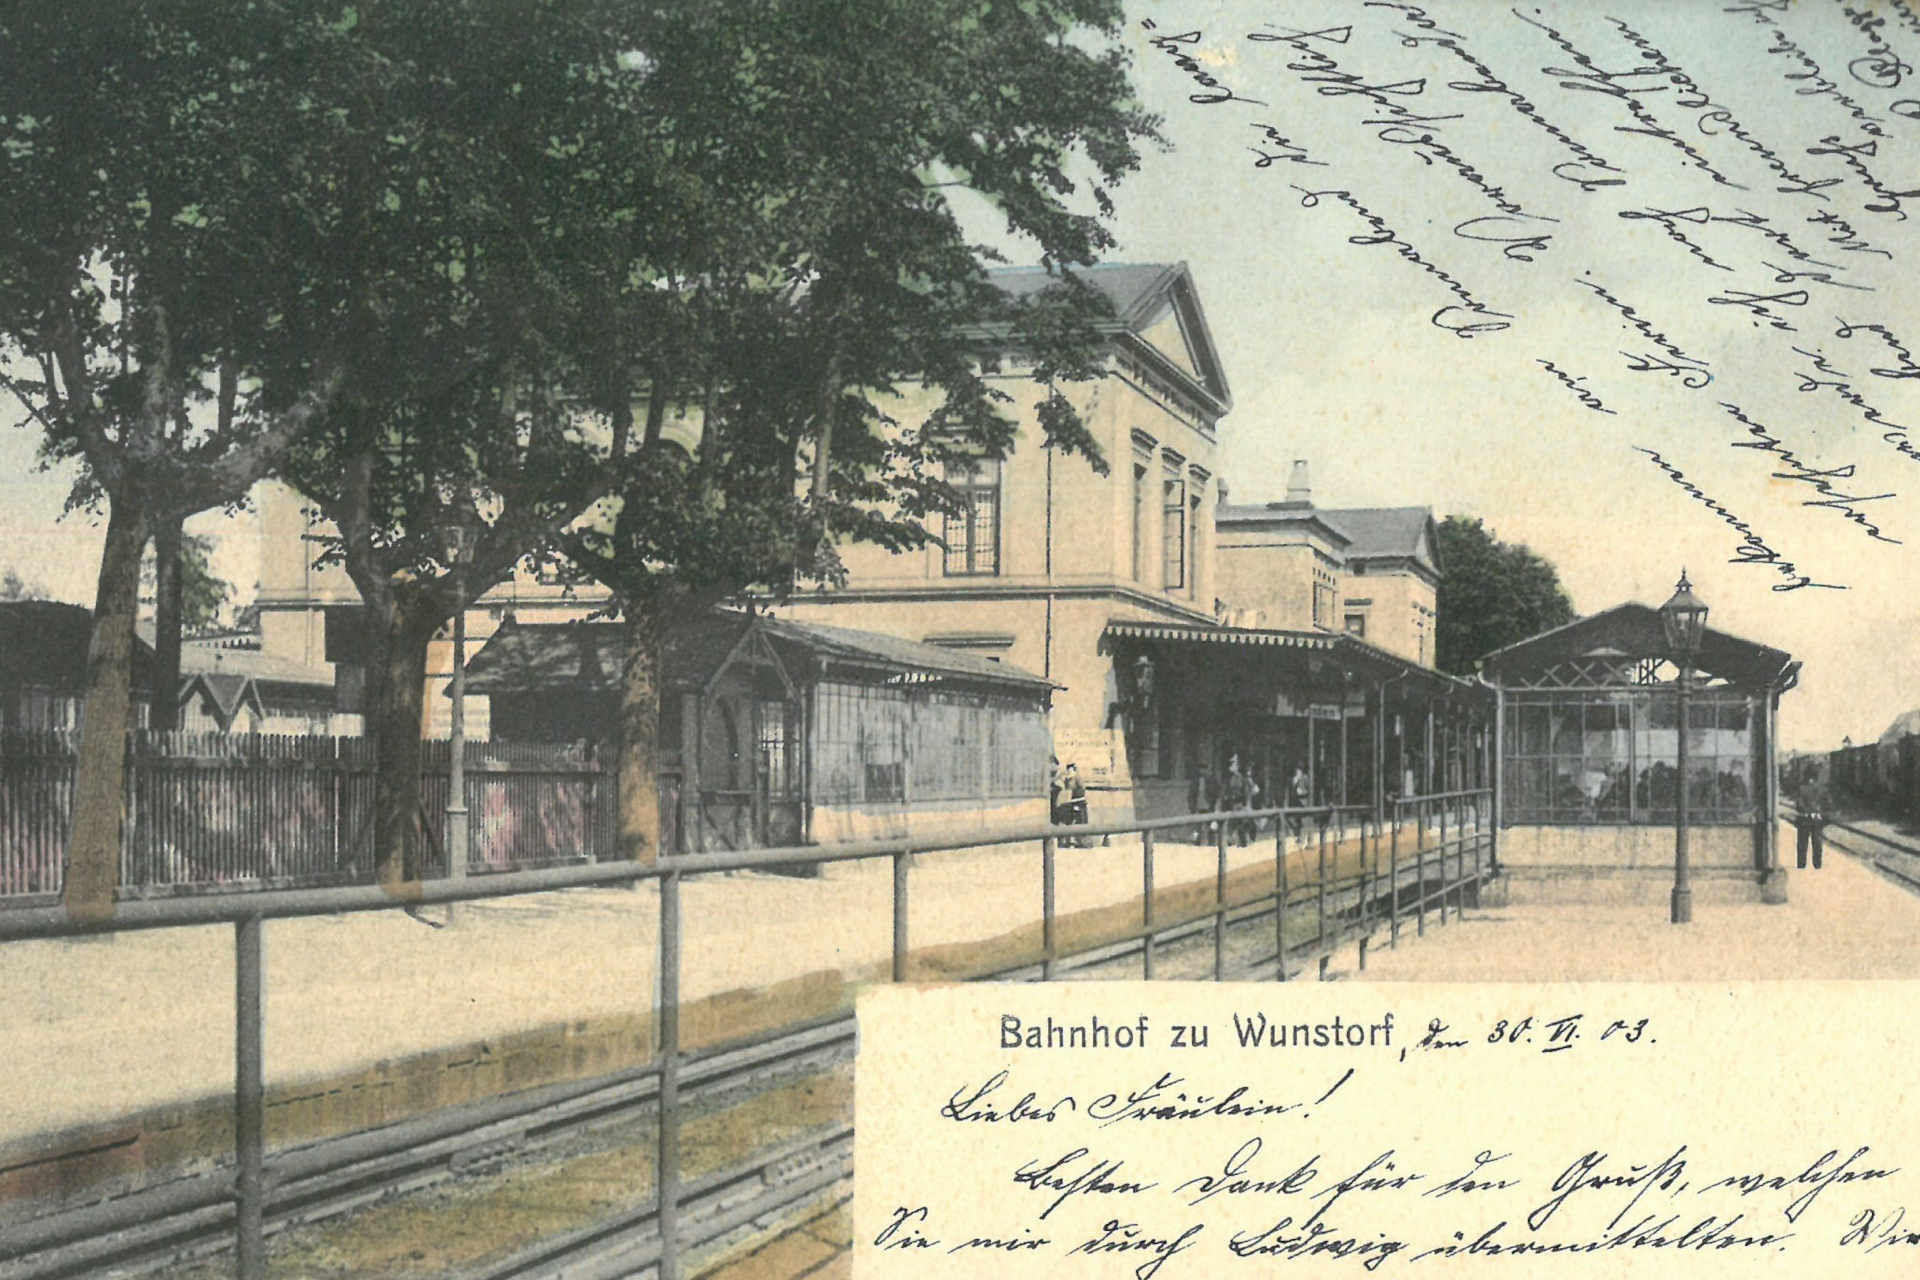 Bahnhof Wunstorf historisch